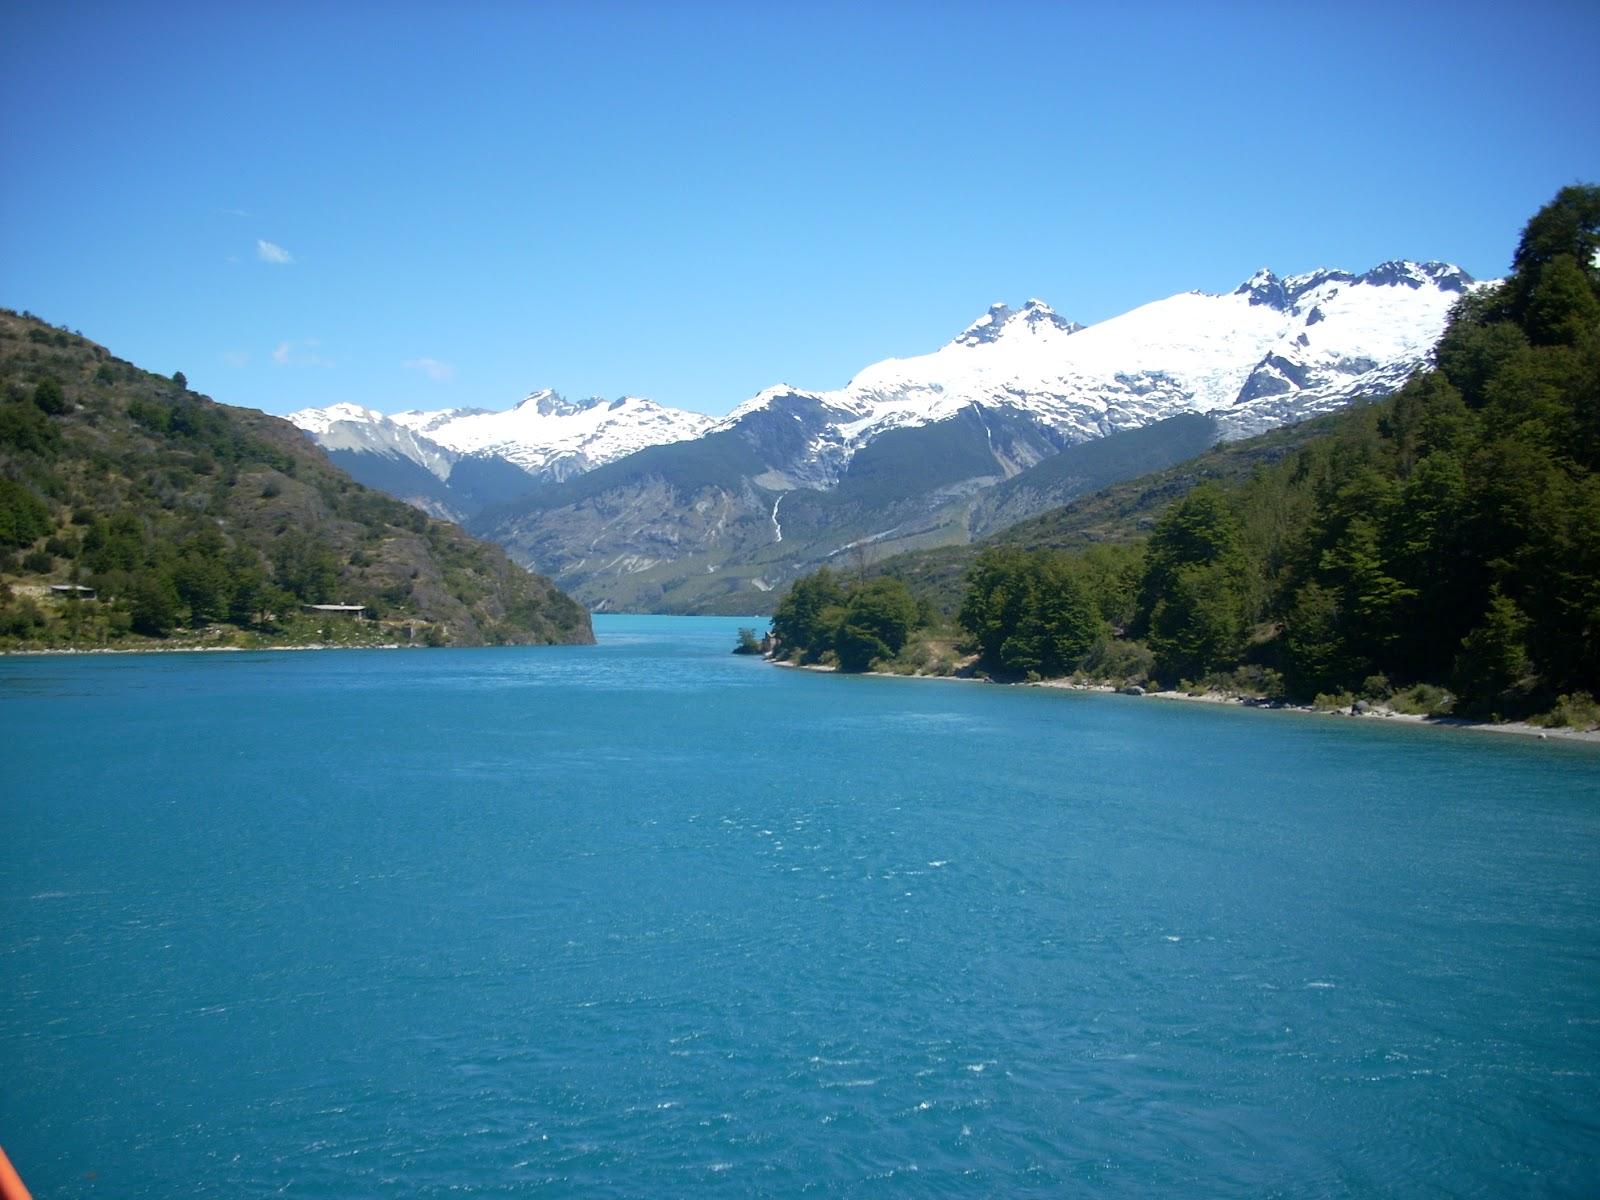 Looking through to Lago Bertrand